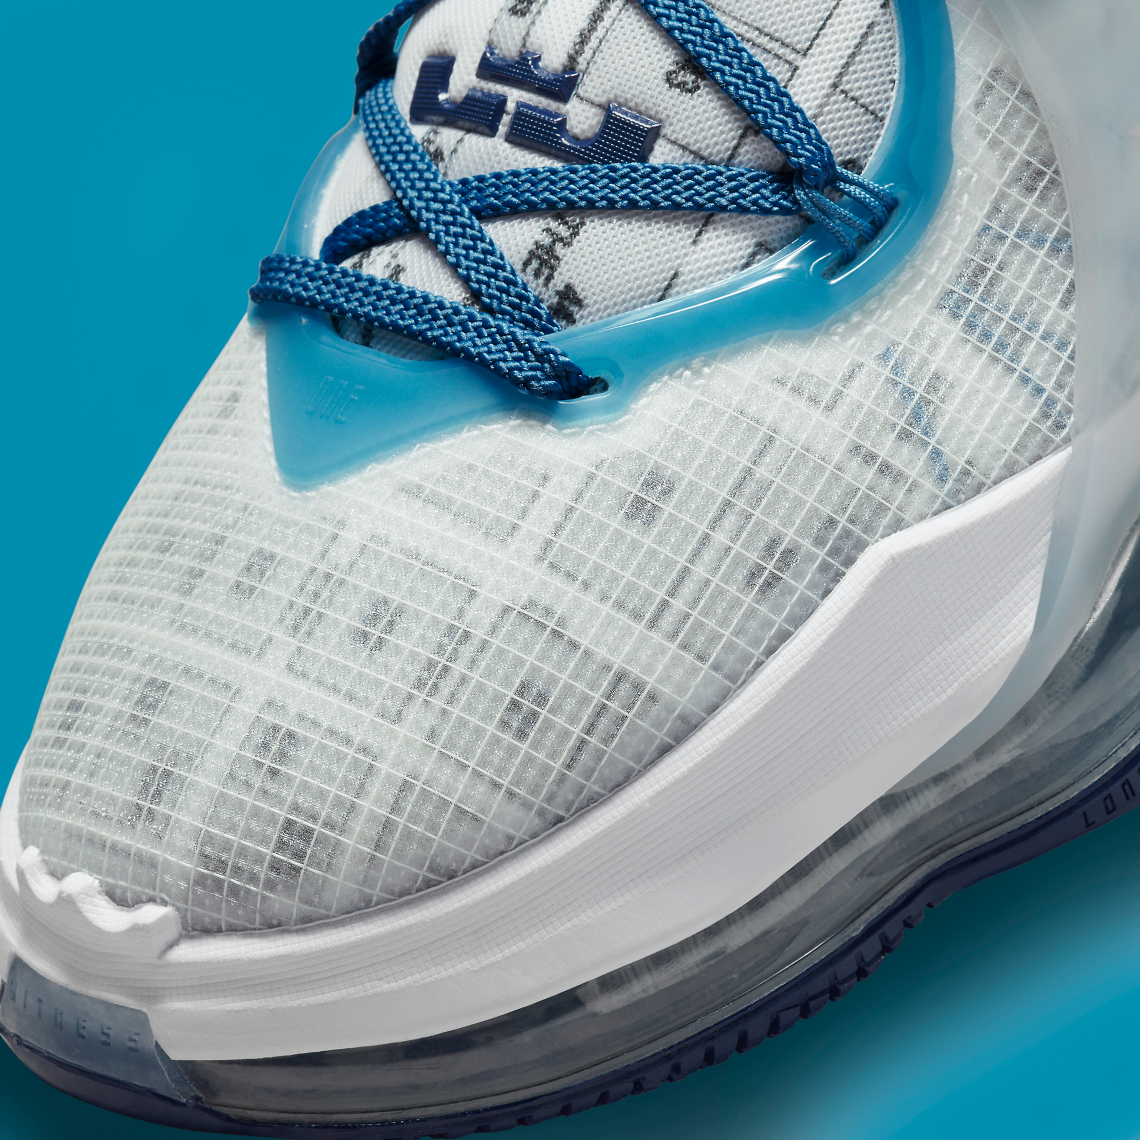 Nike LeBron 19 Space Jam